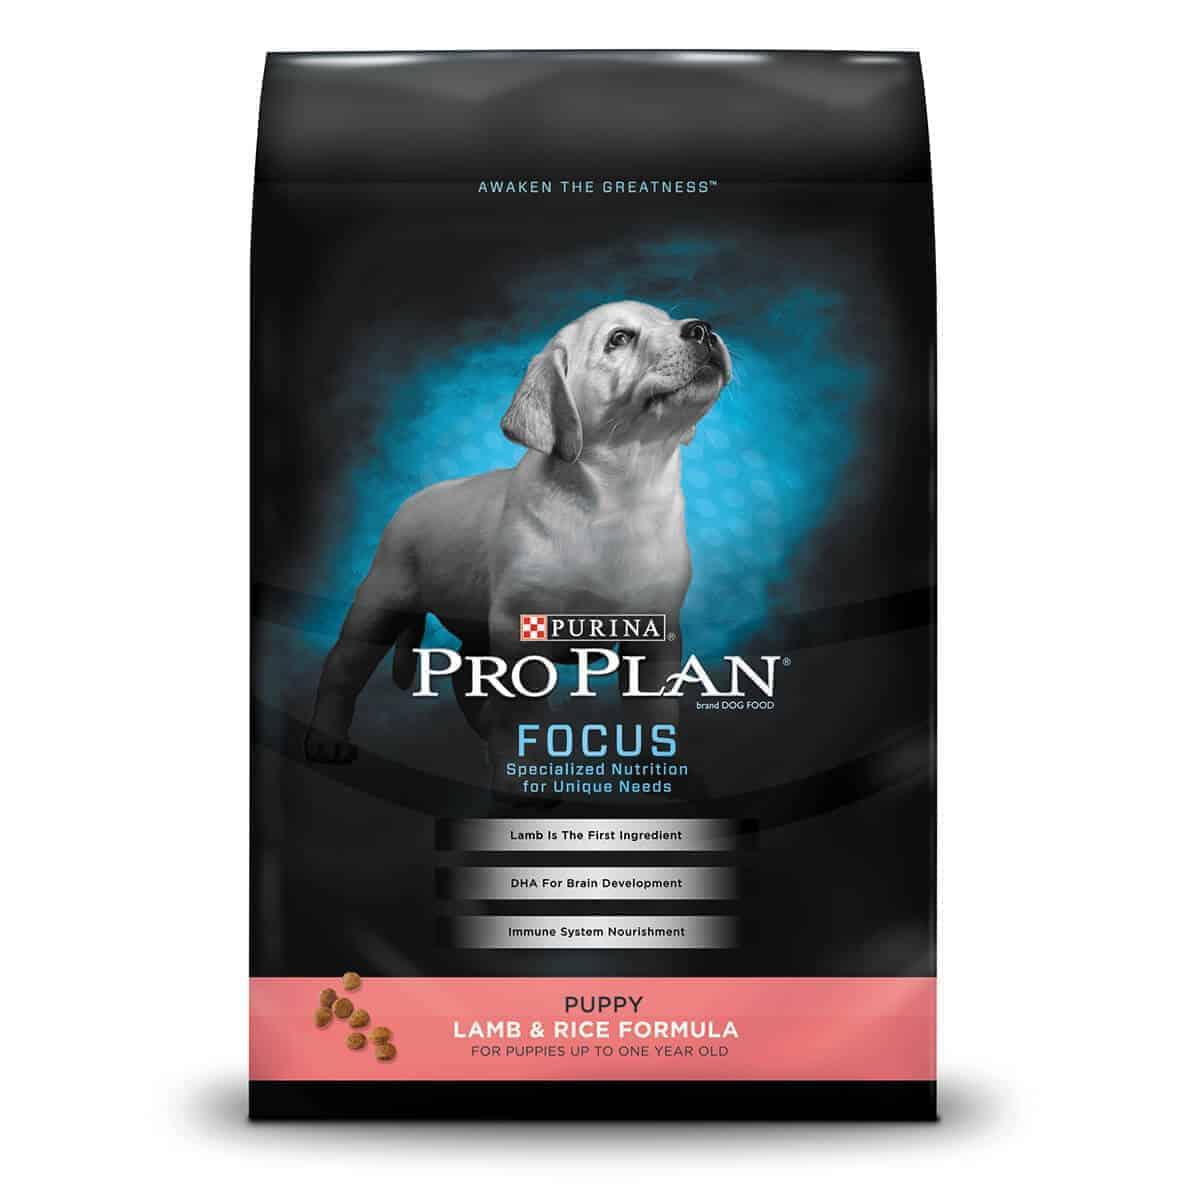 Purina Pro Plan Focus Puppy Lamb & Rice, 6 lb